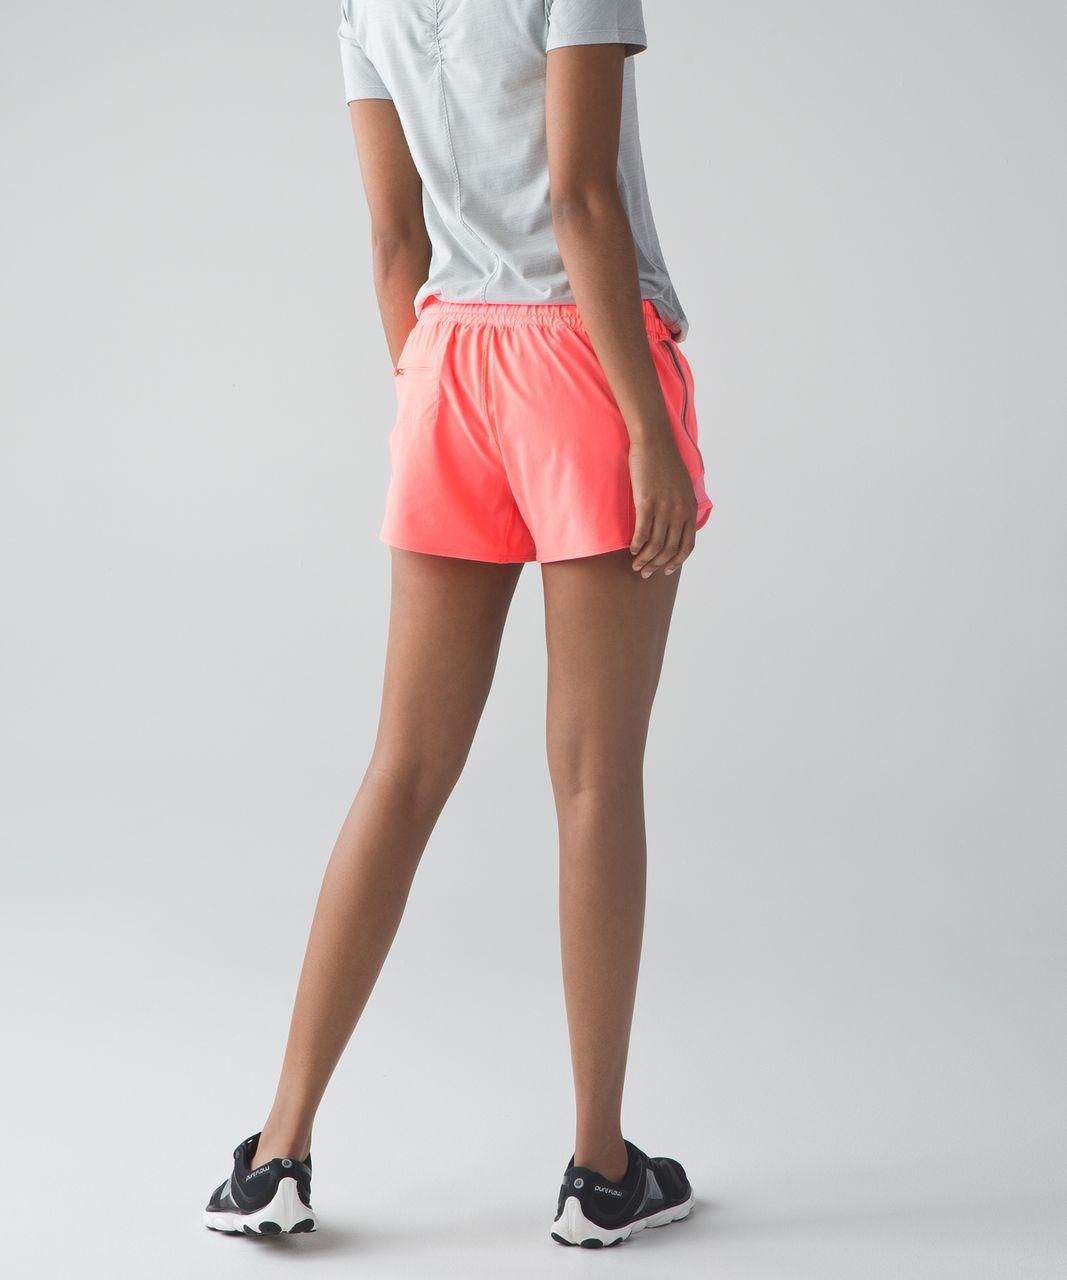 Lululemon Hotty Hot Short (Long) - Grapefruit